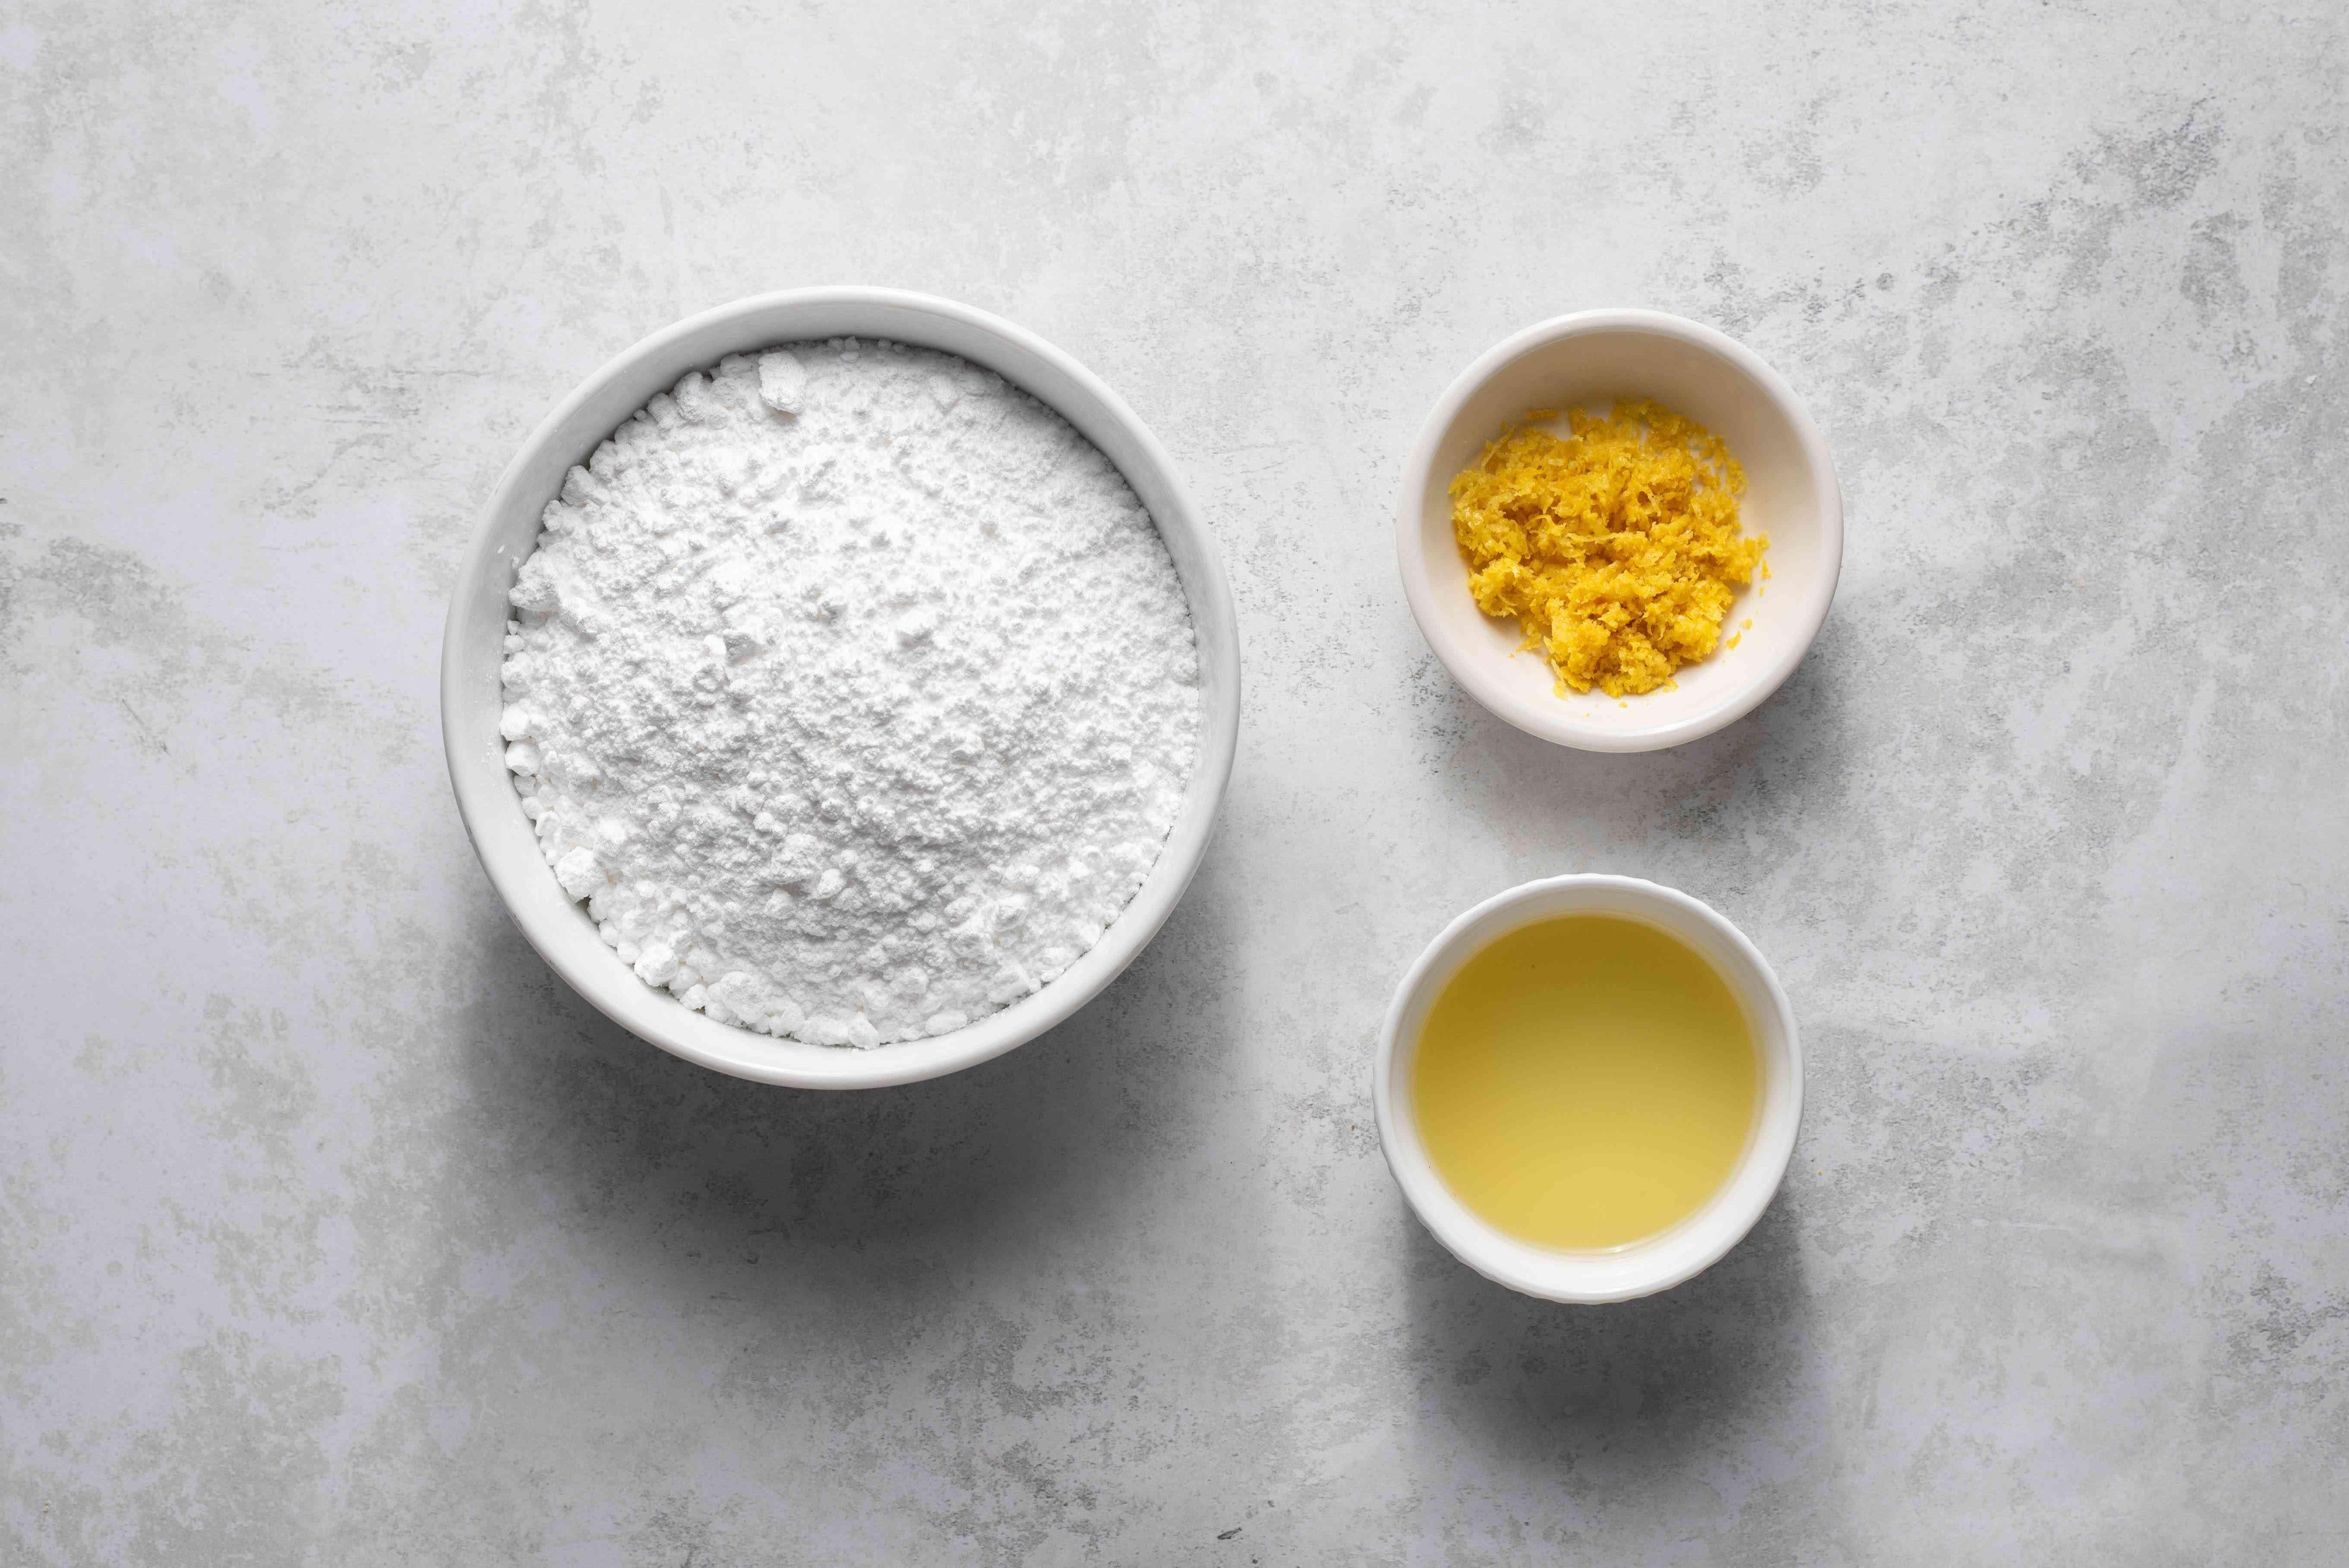 icing ingredients